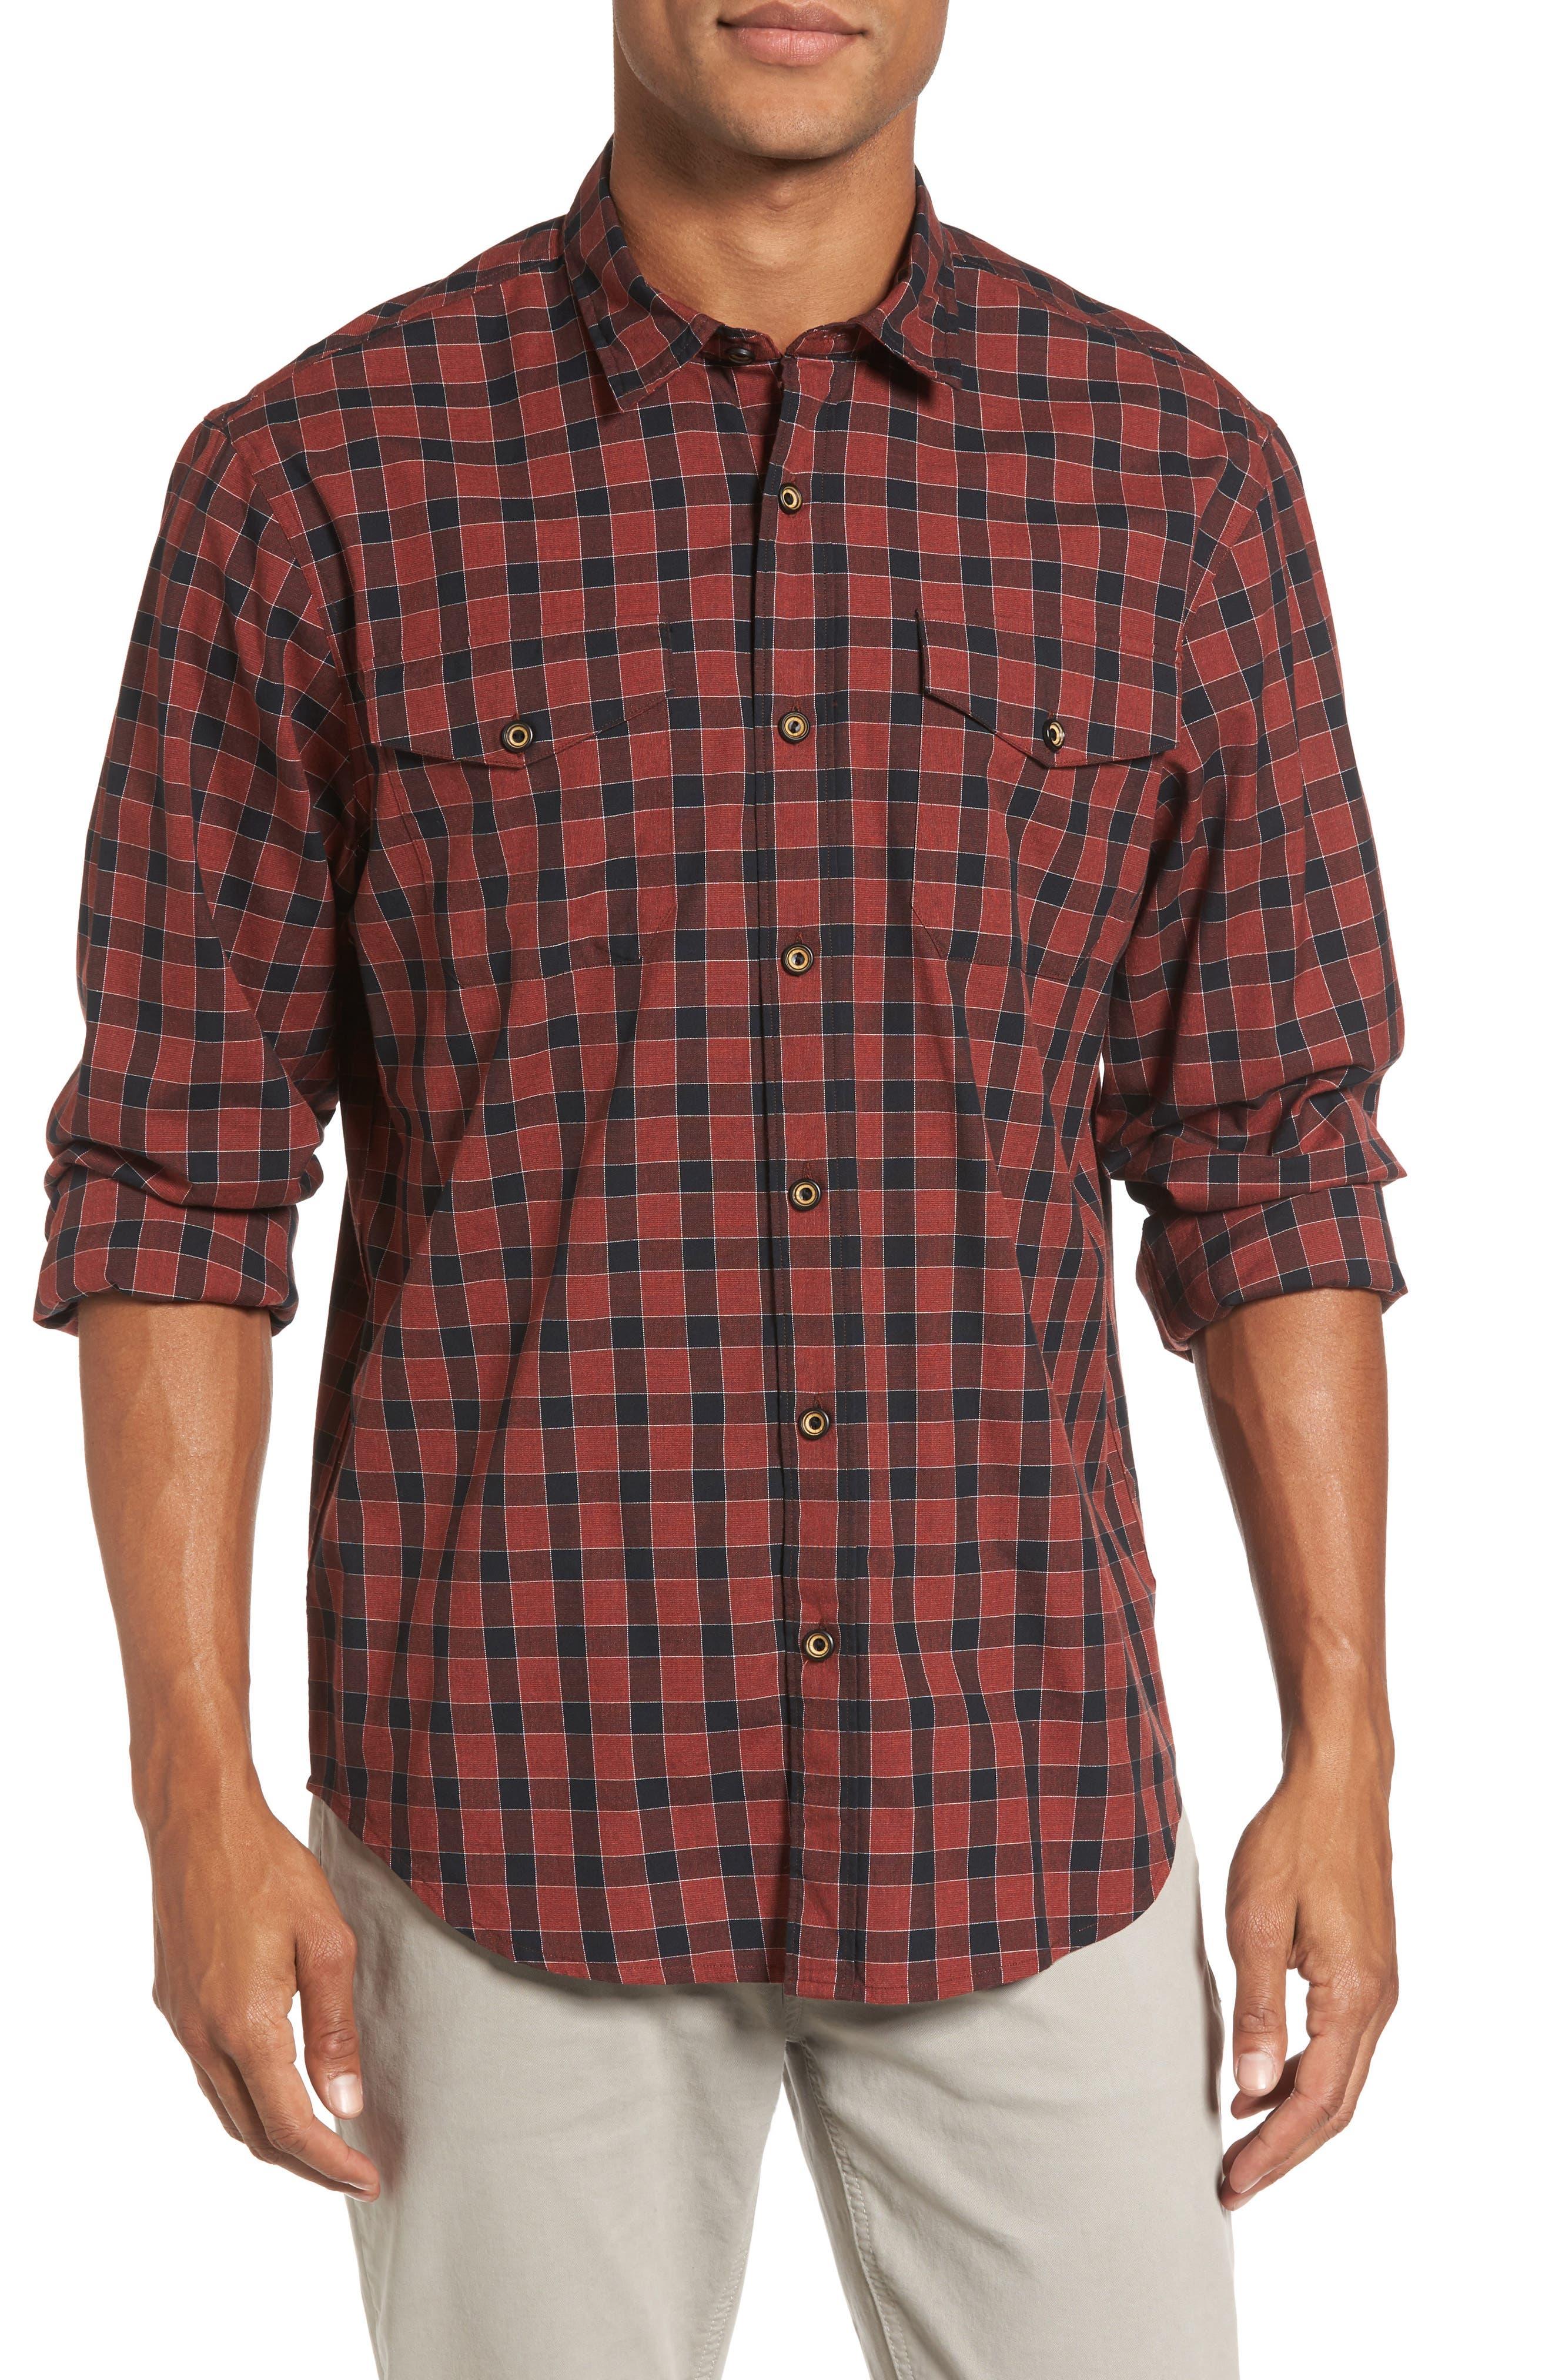 Lake Plaid Flannel Shirt,                             Main thumbnail 1, color,                             Red